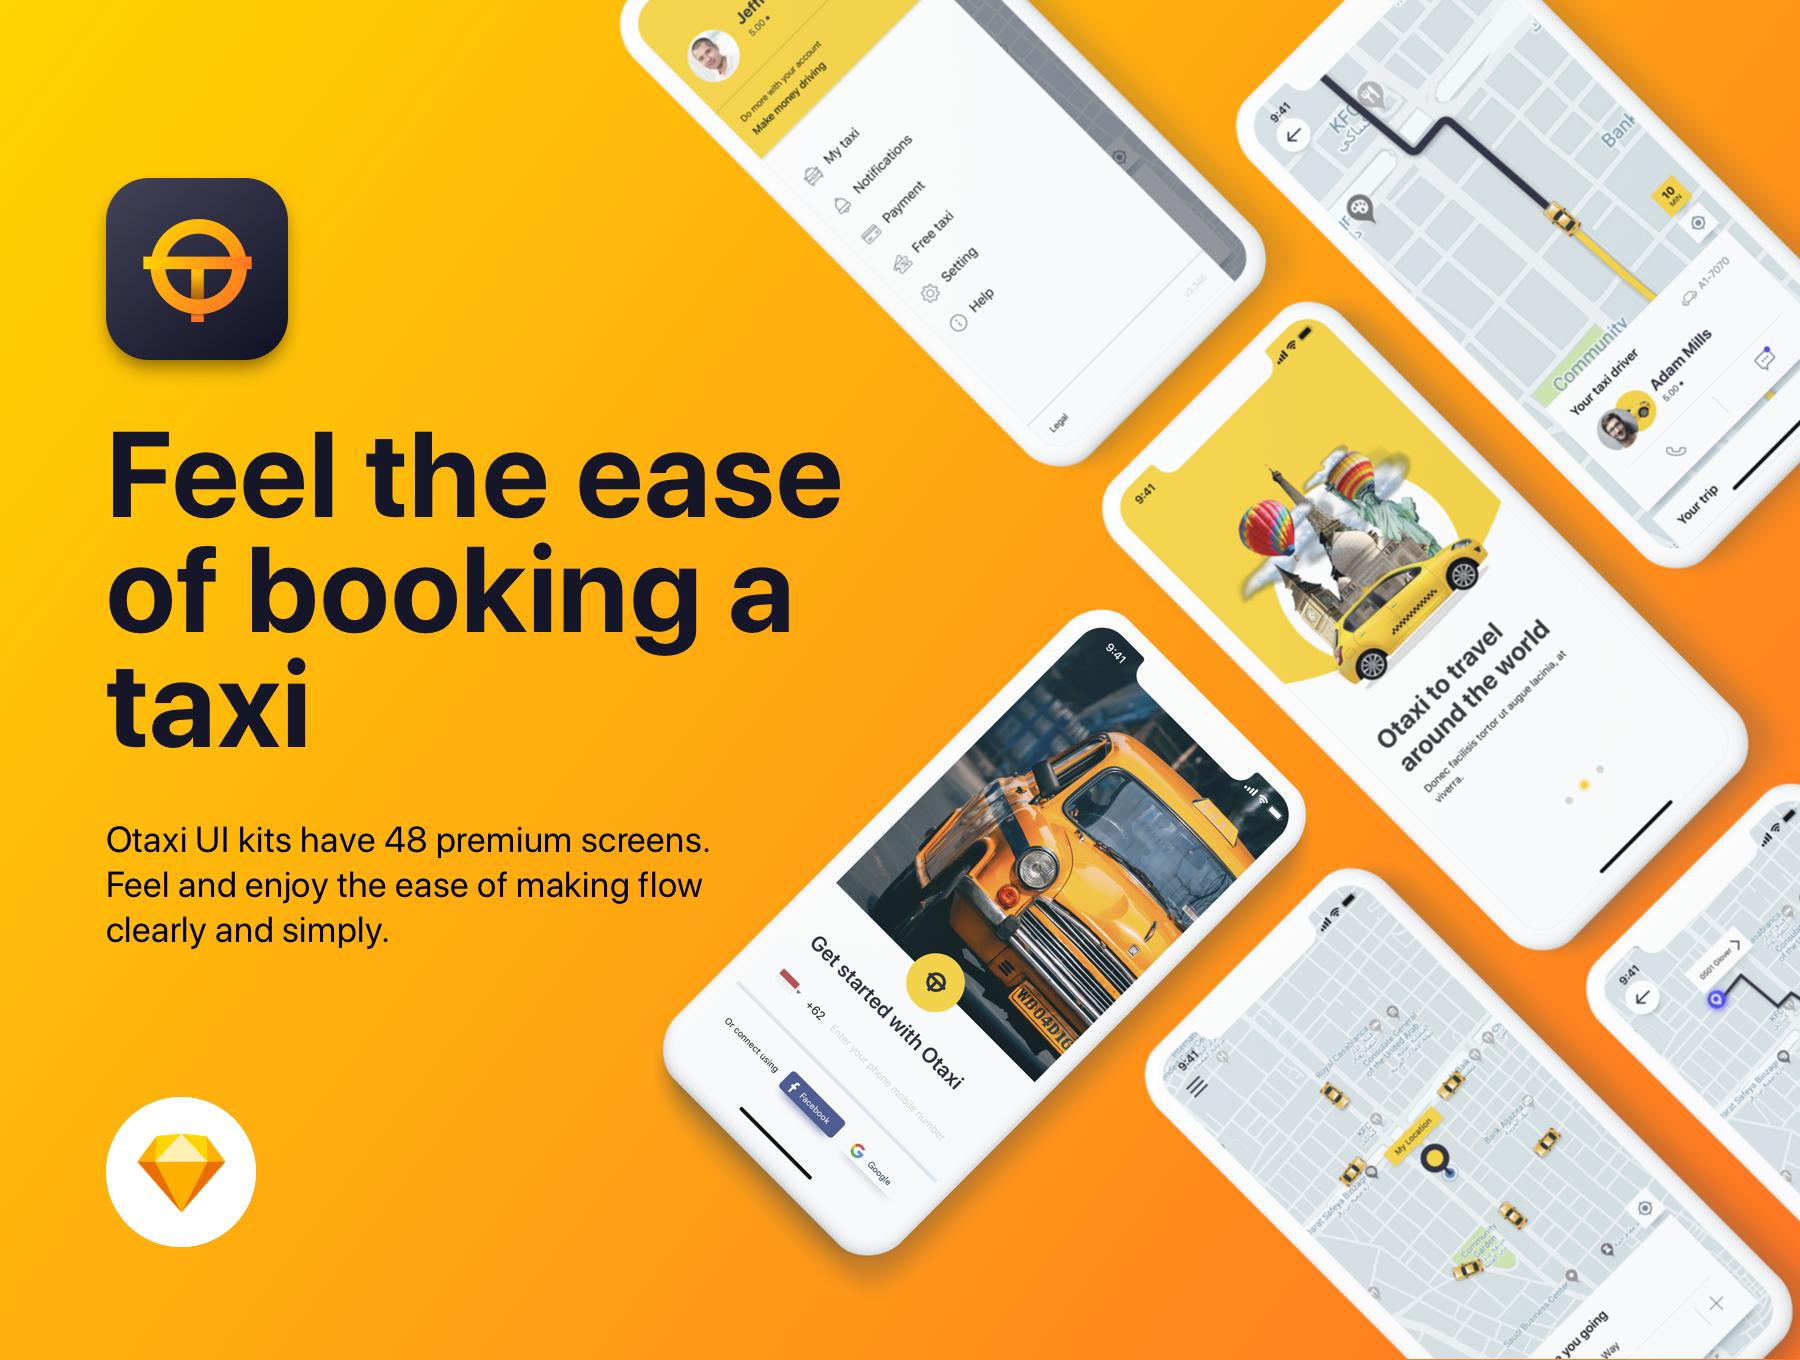 类Uber&滴滴出行叫车APP应用UI设计套件SKETCH模板 Otaxi Mobile UI Kit插图